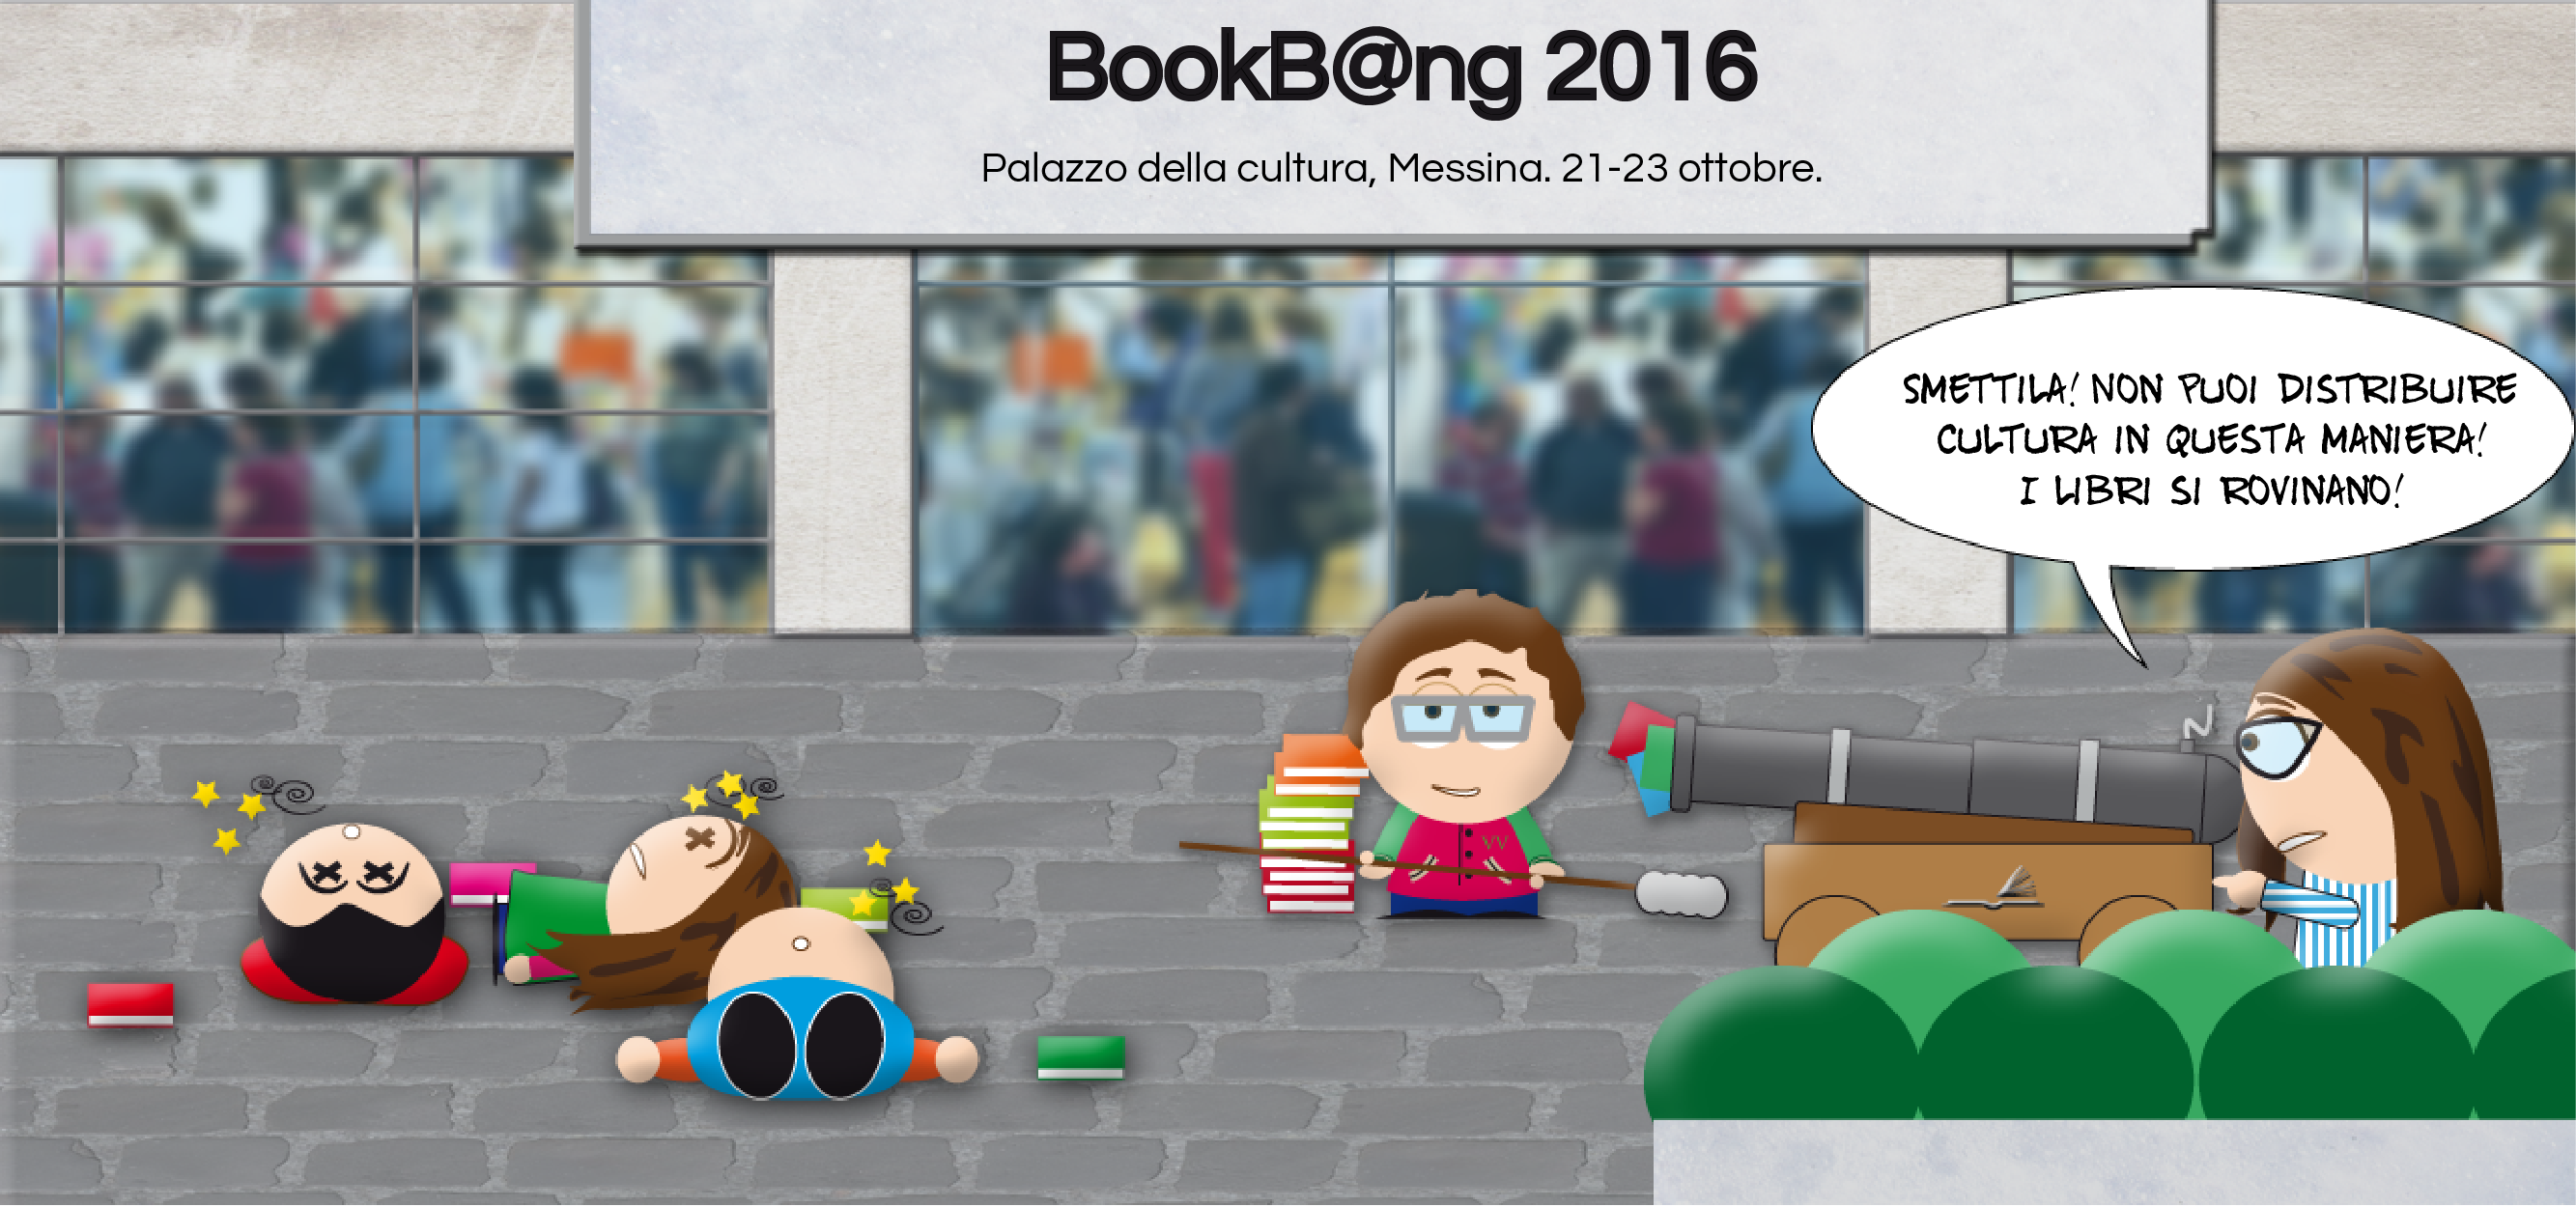 Vignetta Bookbang-02